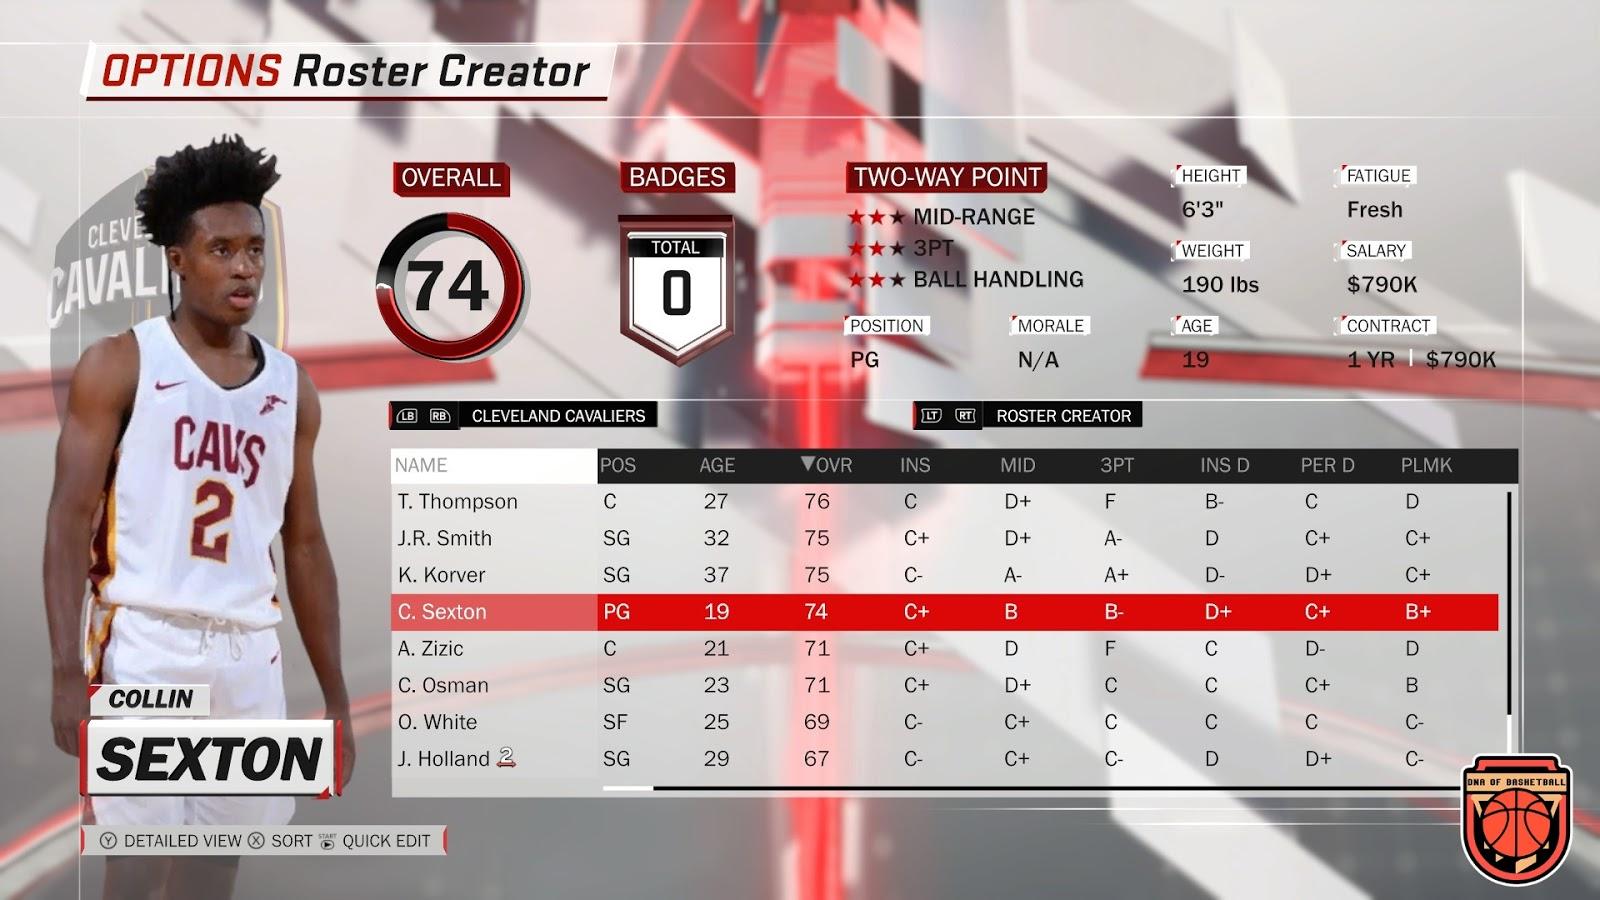 Shuajota | Your Videogame to the Next Level: NBA 2K18 DNA